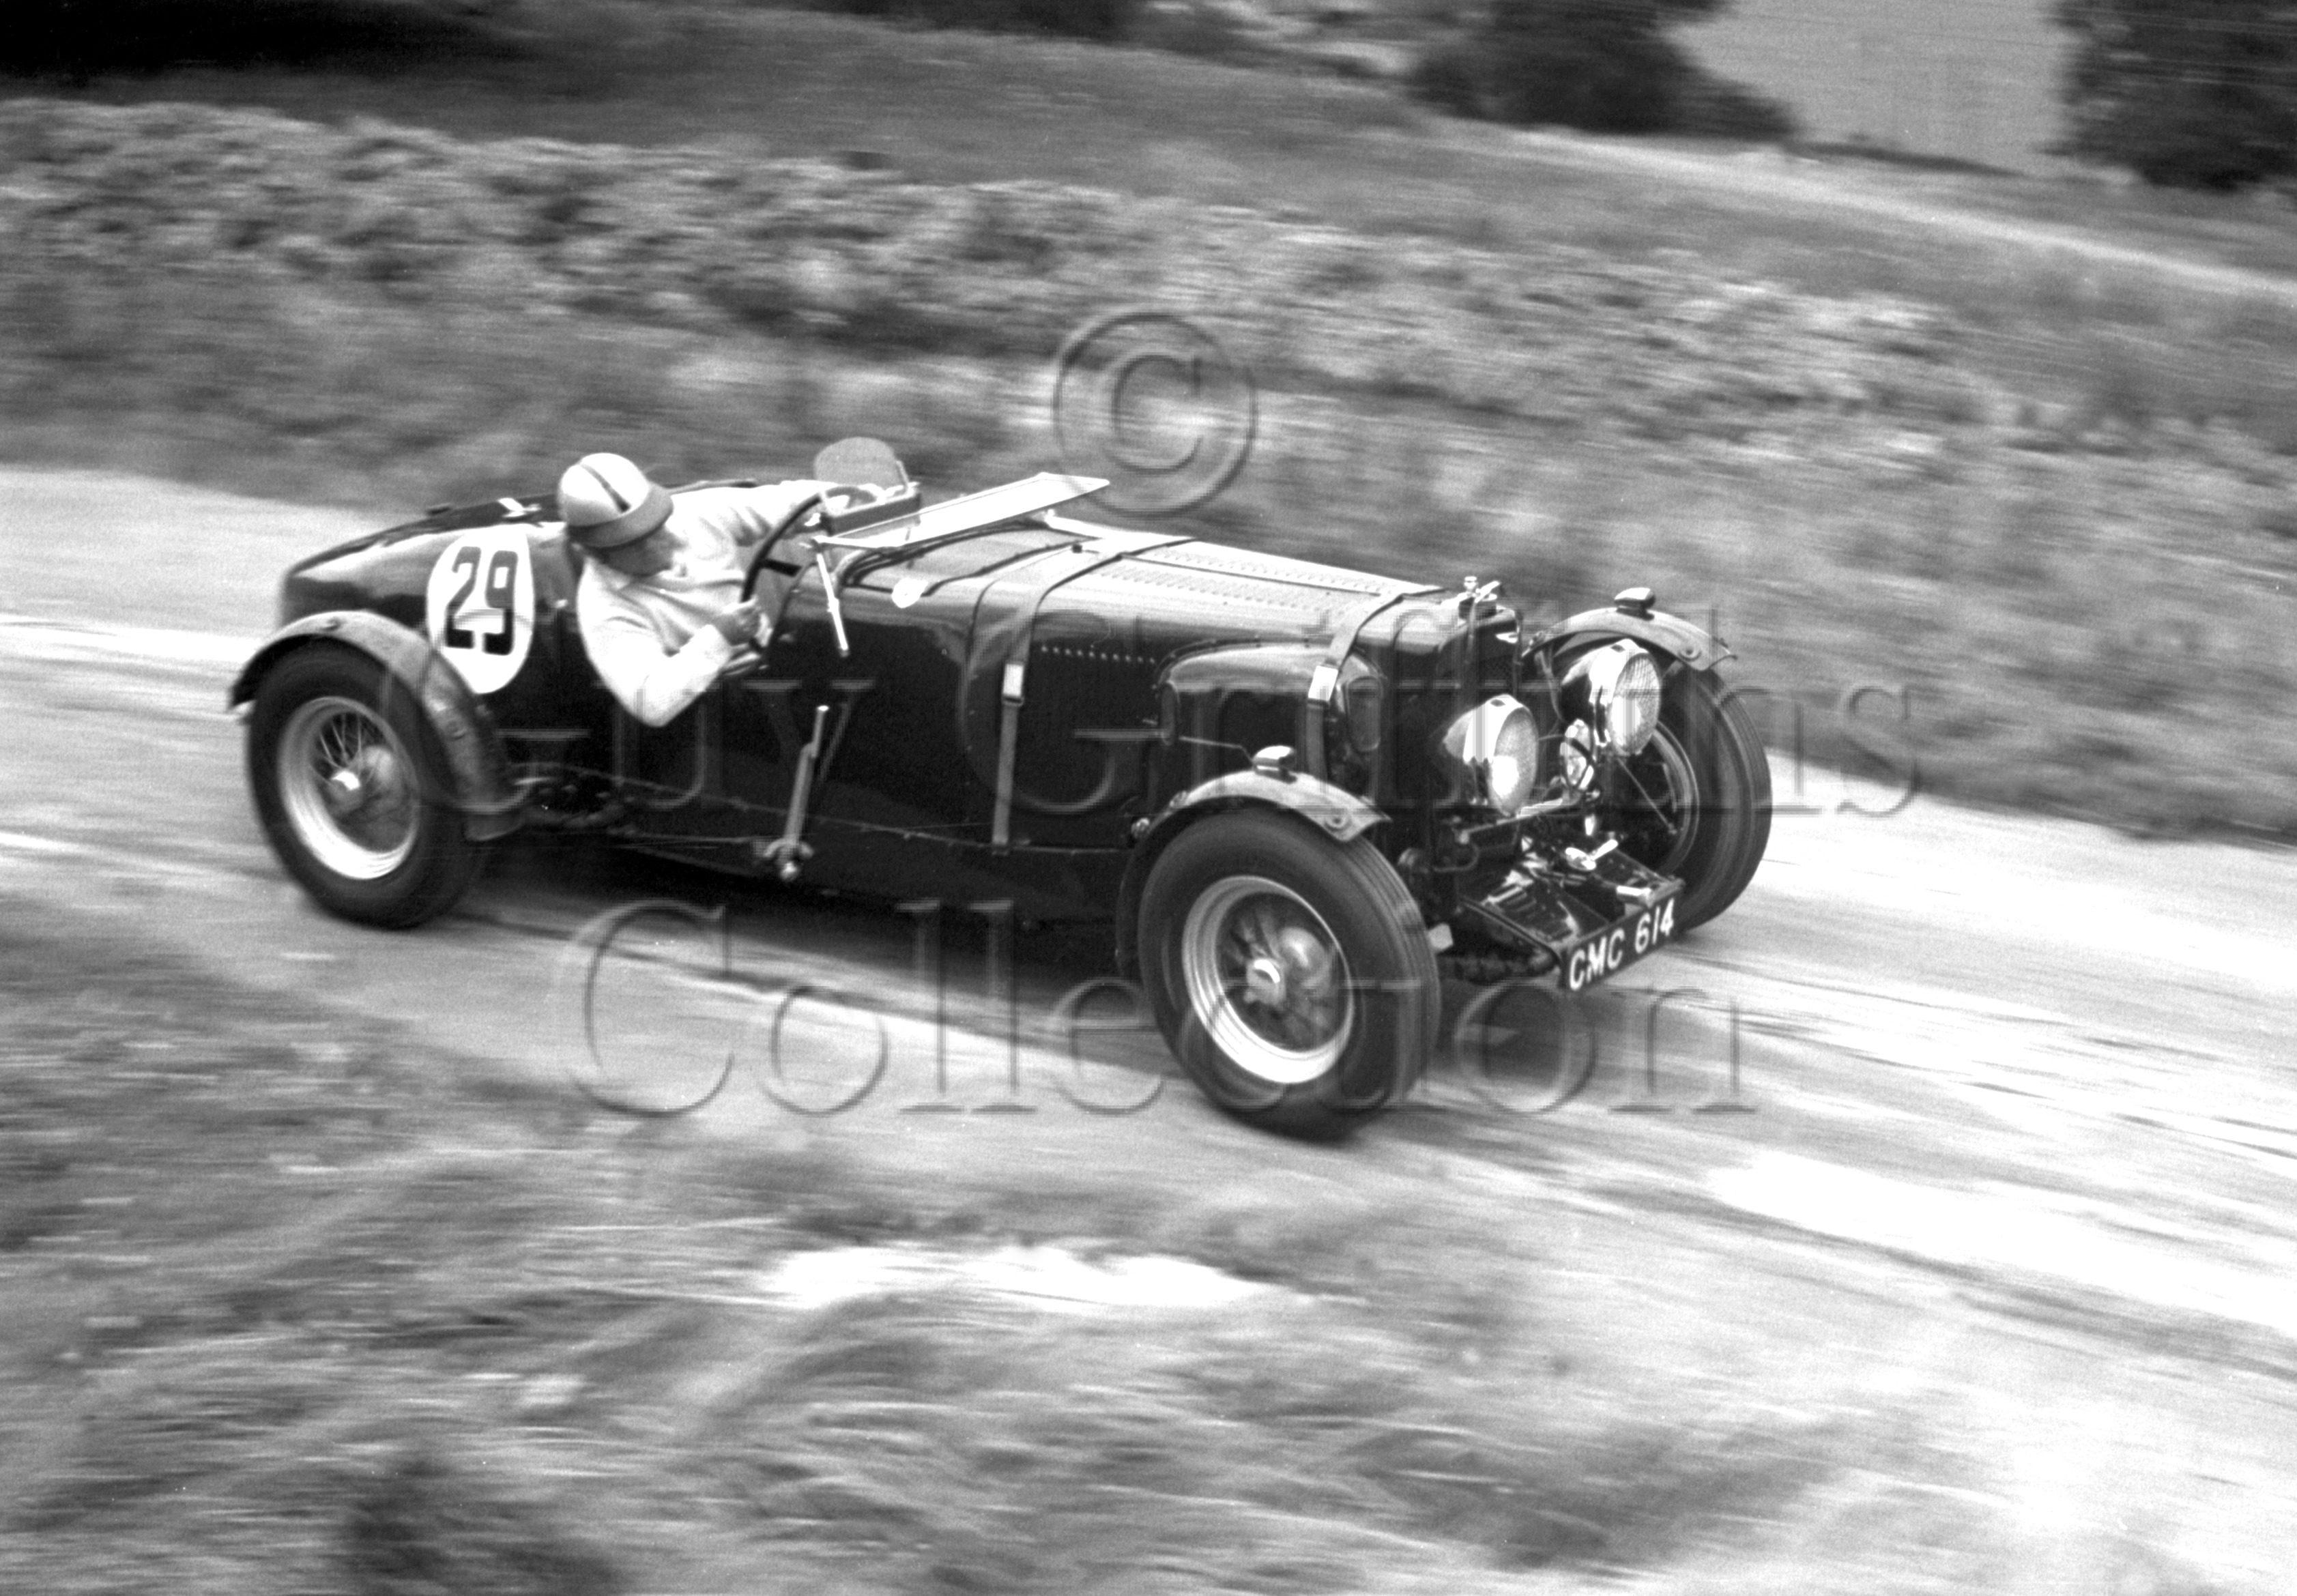 77-552—-Aston-Martin–Prescott–18-08-1963.jpg - The Guy Griffiths Collection